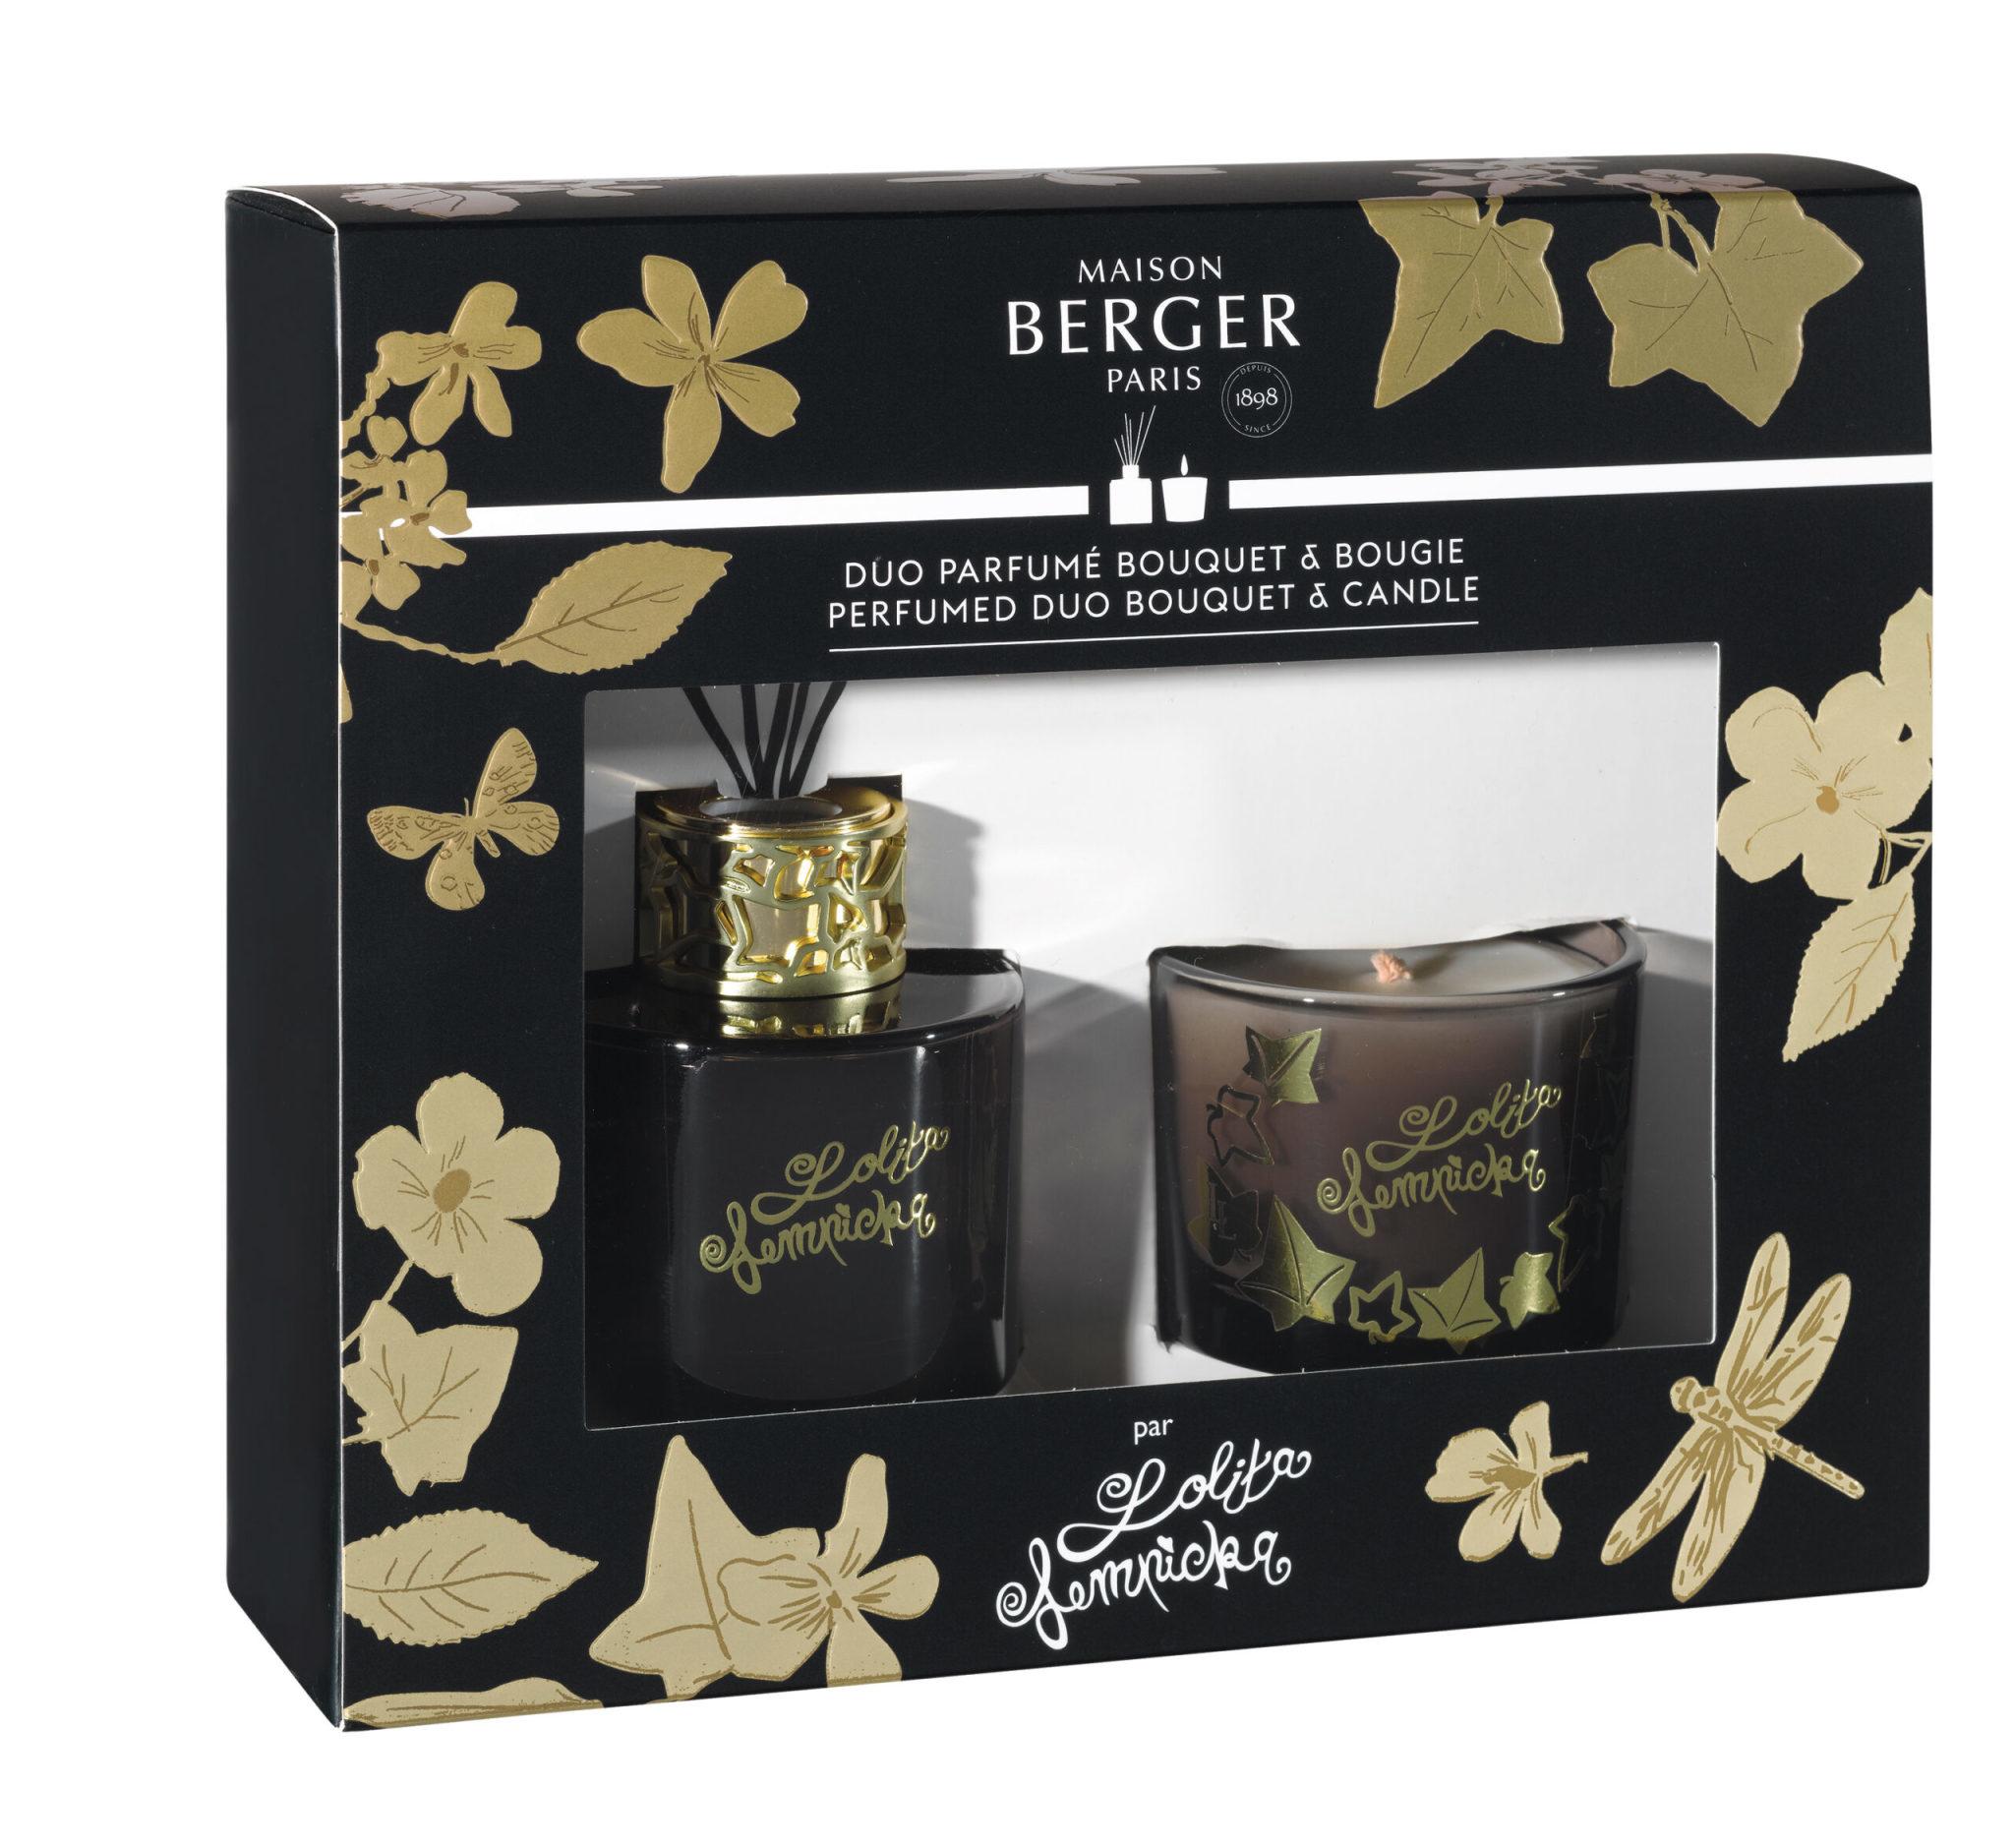 Maison Berger Duo Mini Set Black Edition Lolita Lempicka